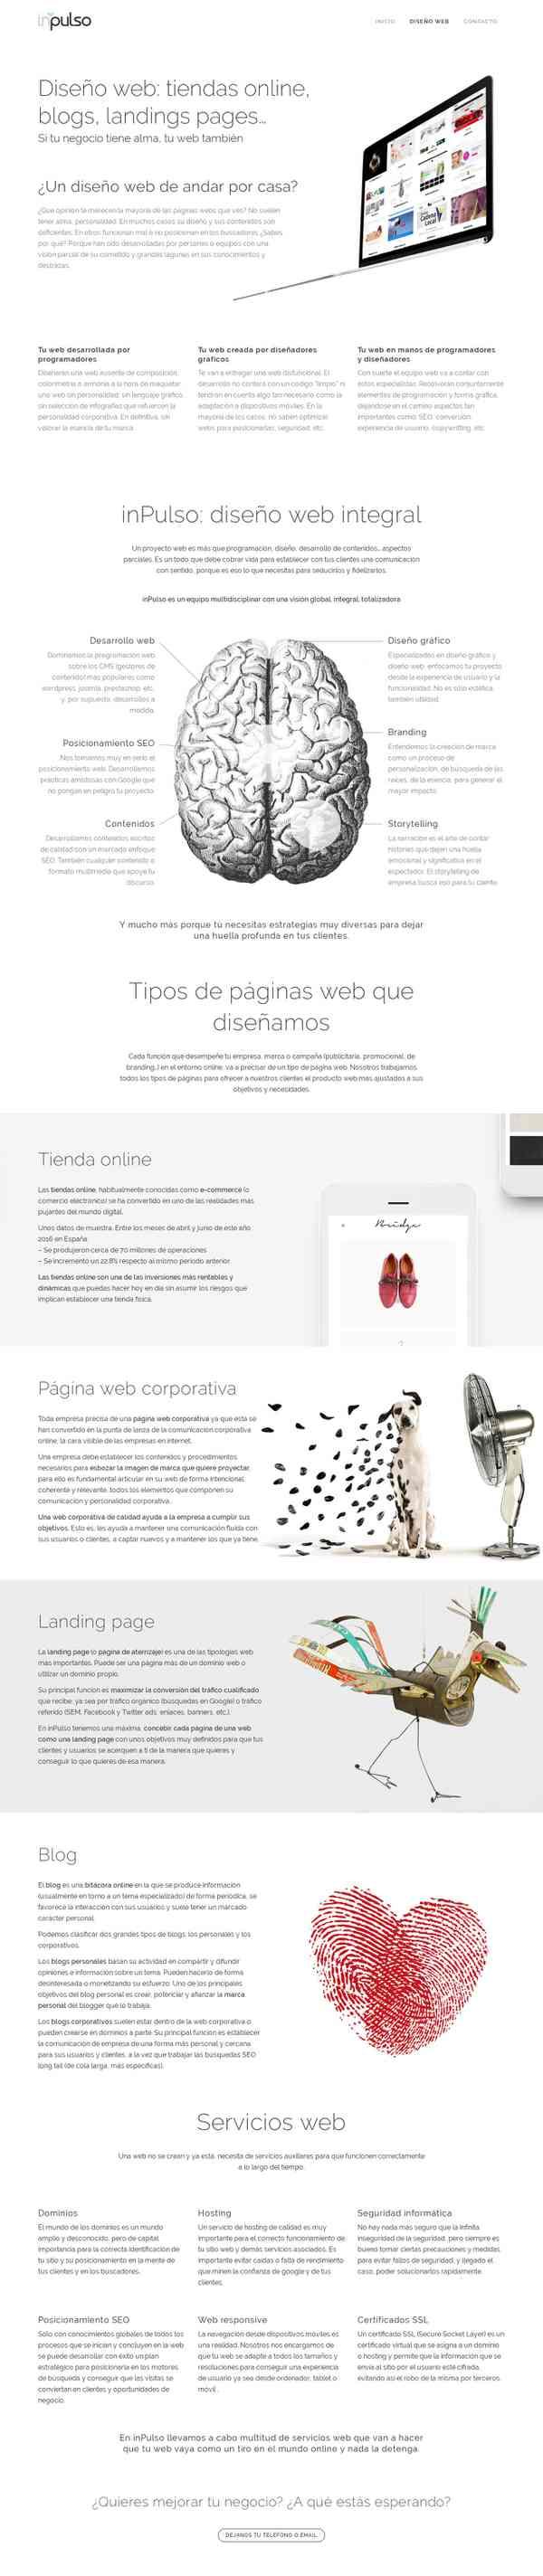 Diseño web: tiendas online, blogs, landings pages... | Toledo | Inpulso.es